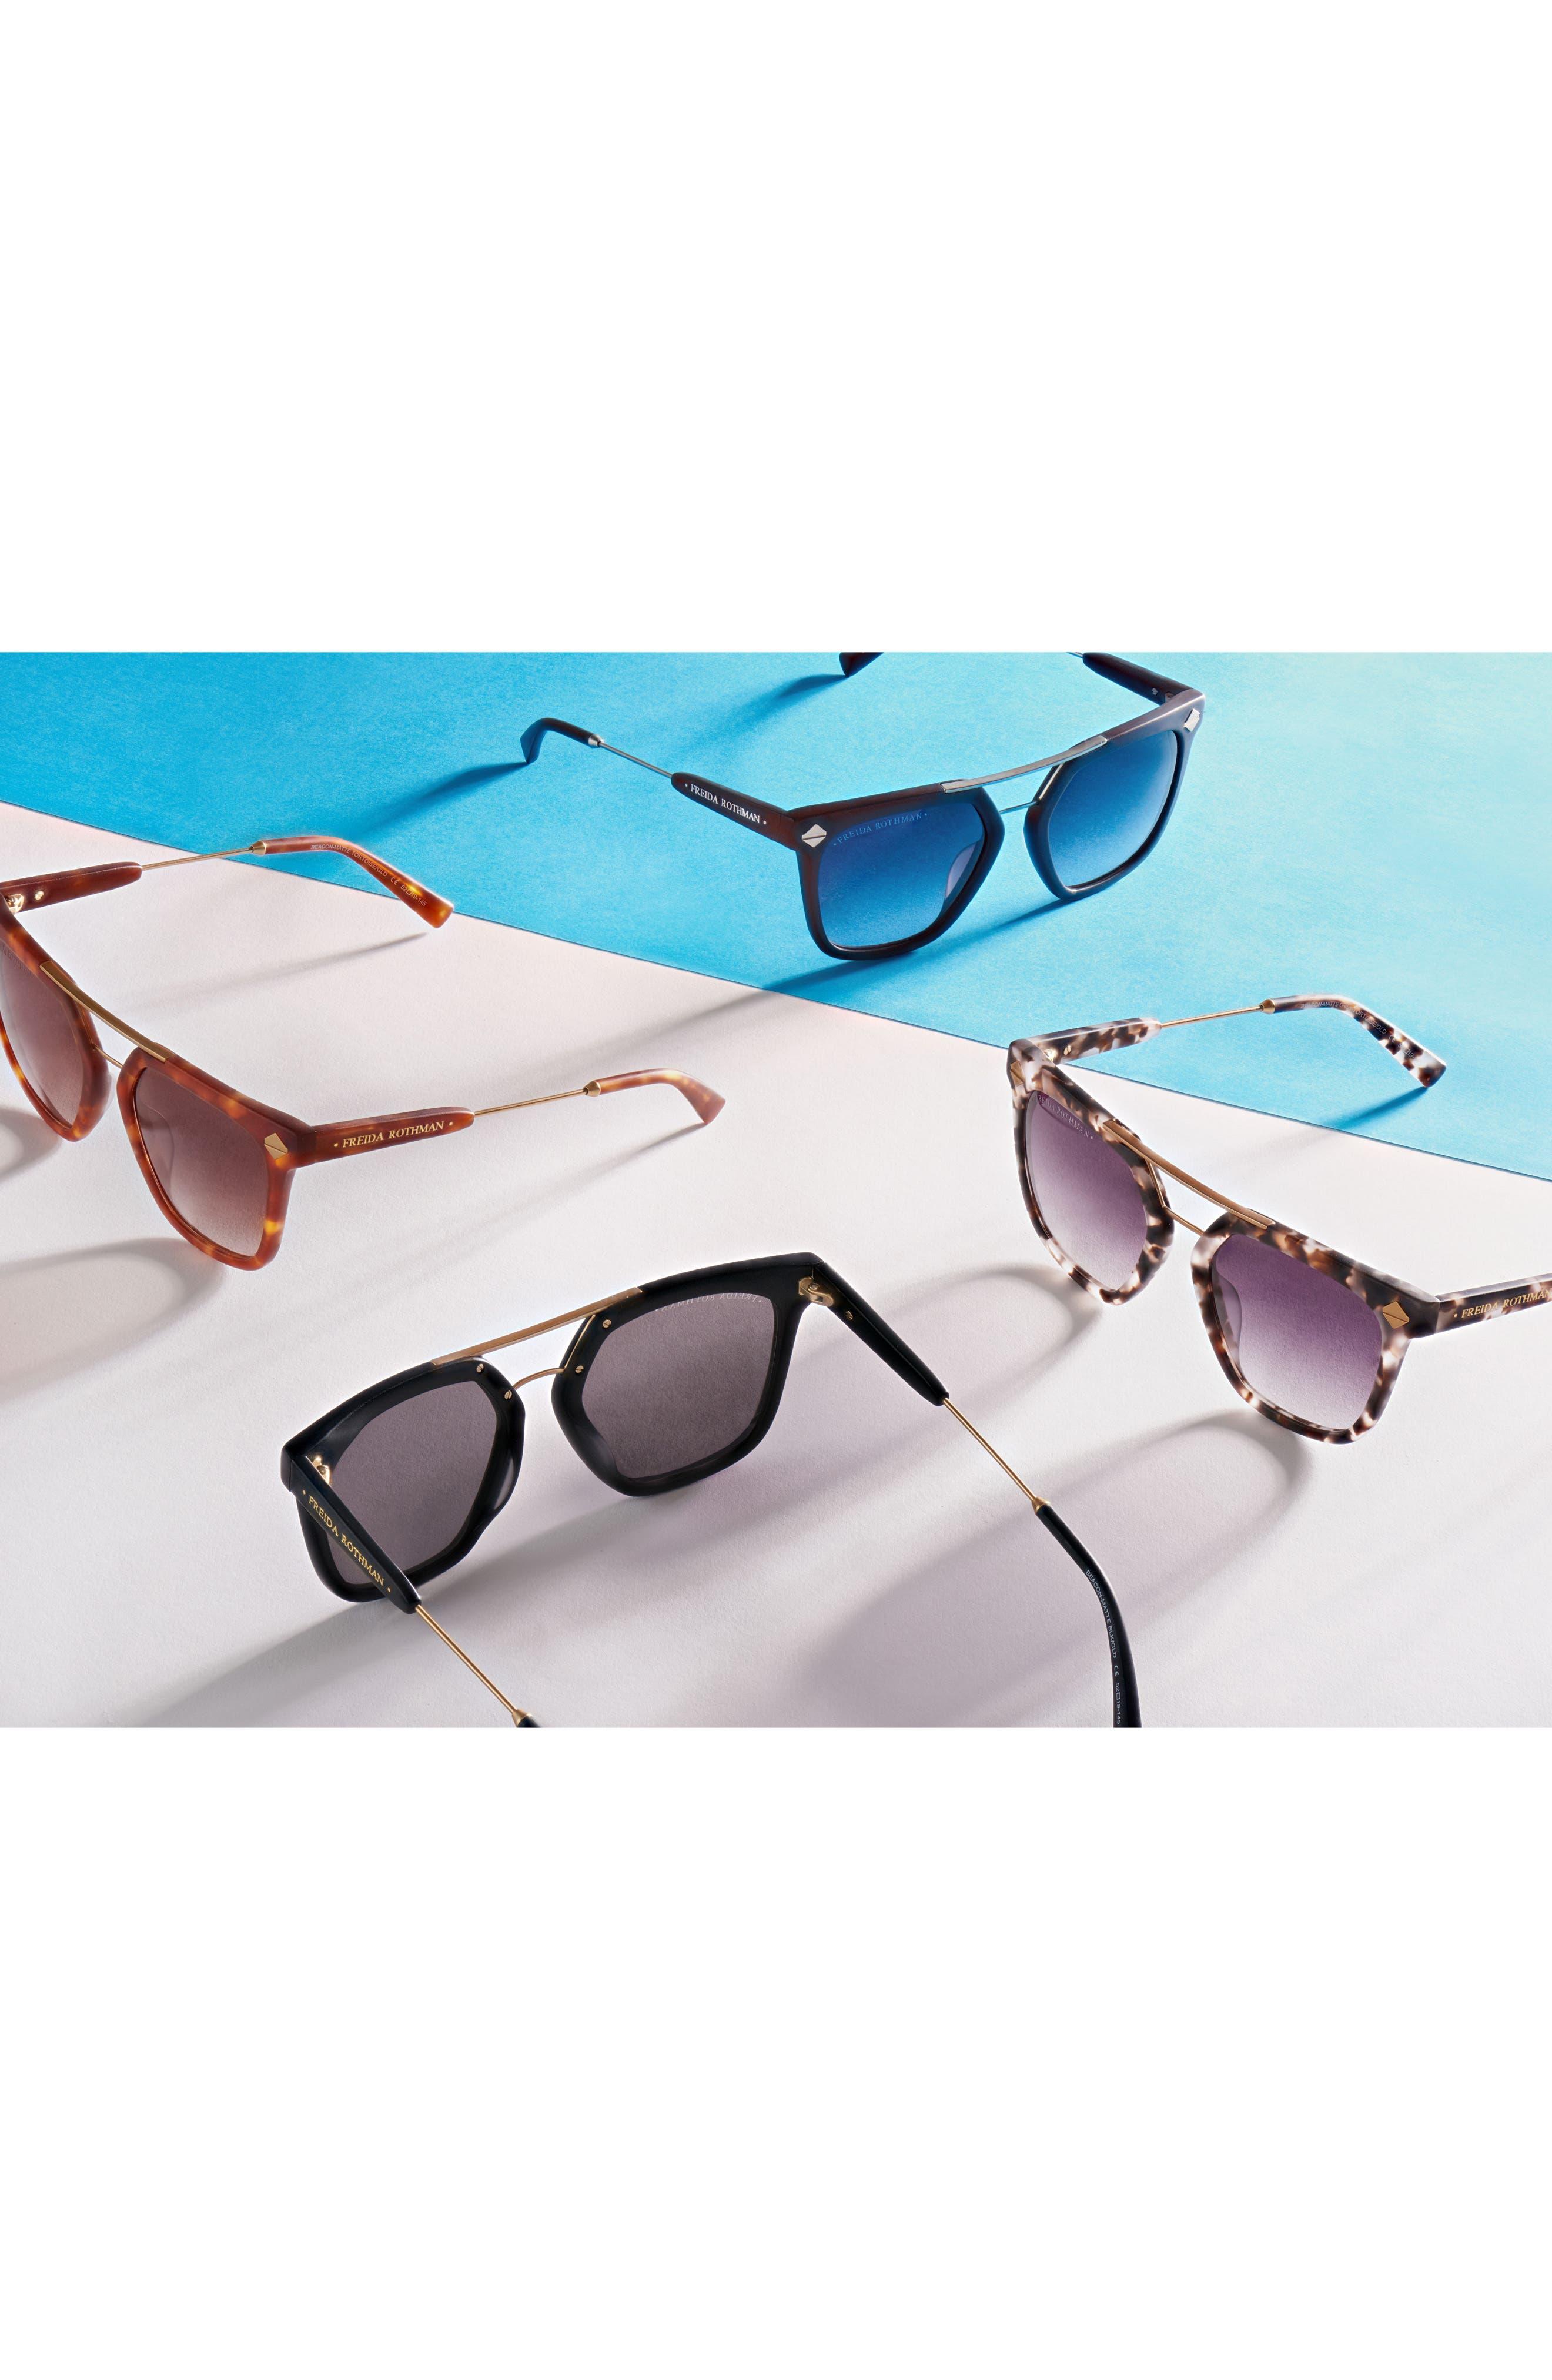 Beacon 52mm Aviator Sunglasses,                             Alternate thumbnail 2, color,                             001